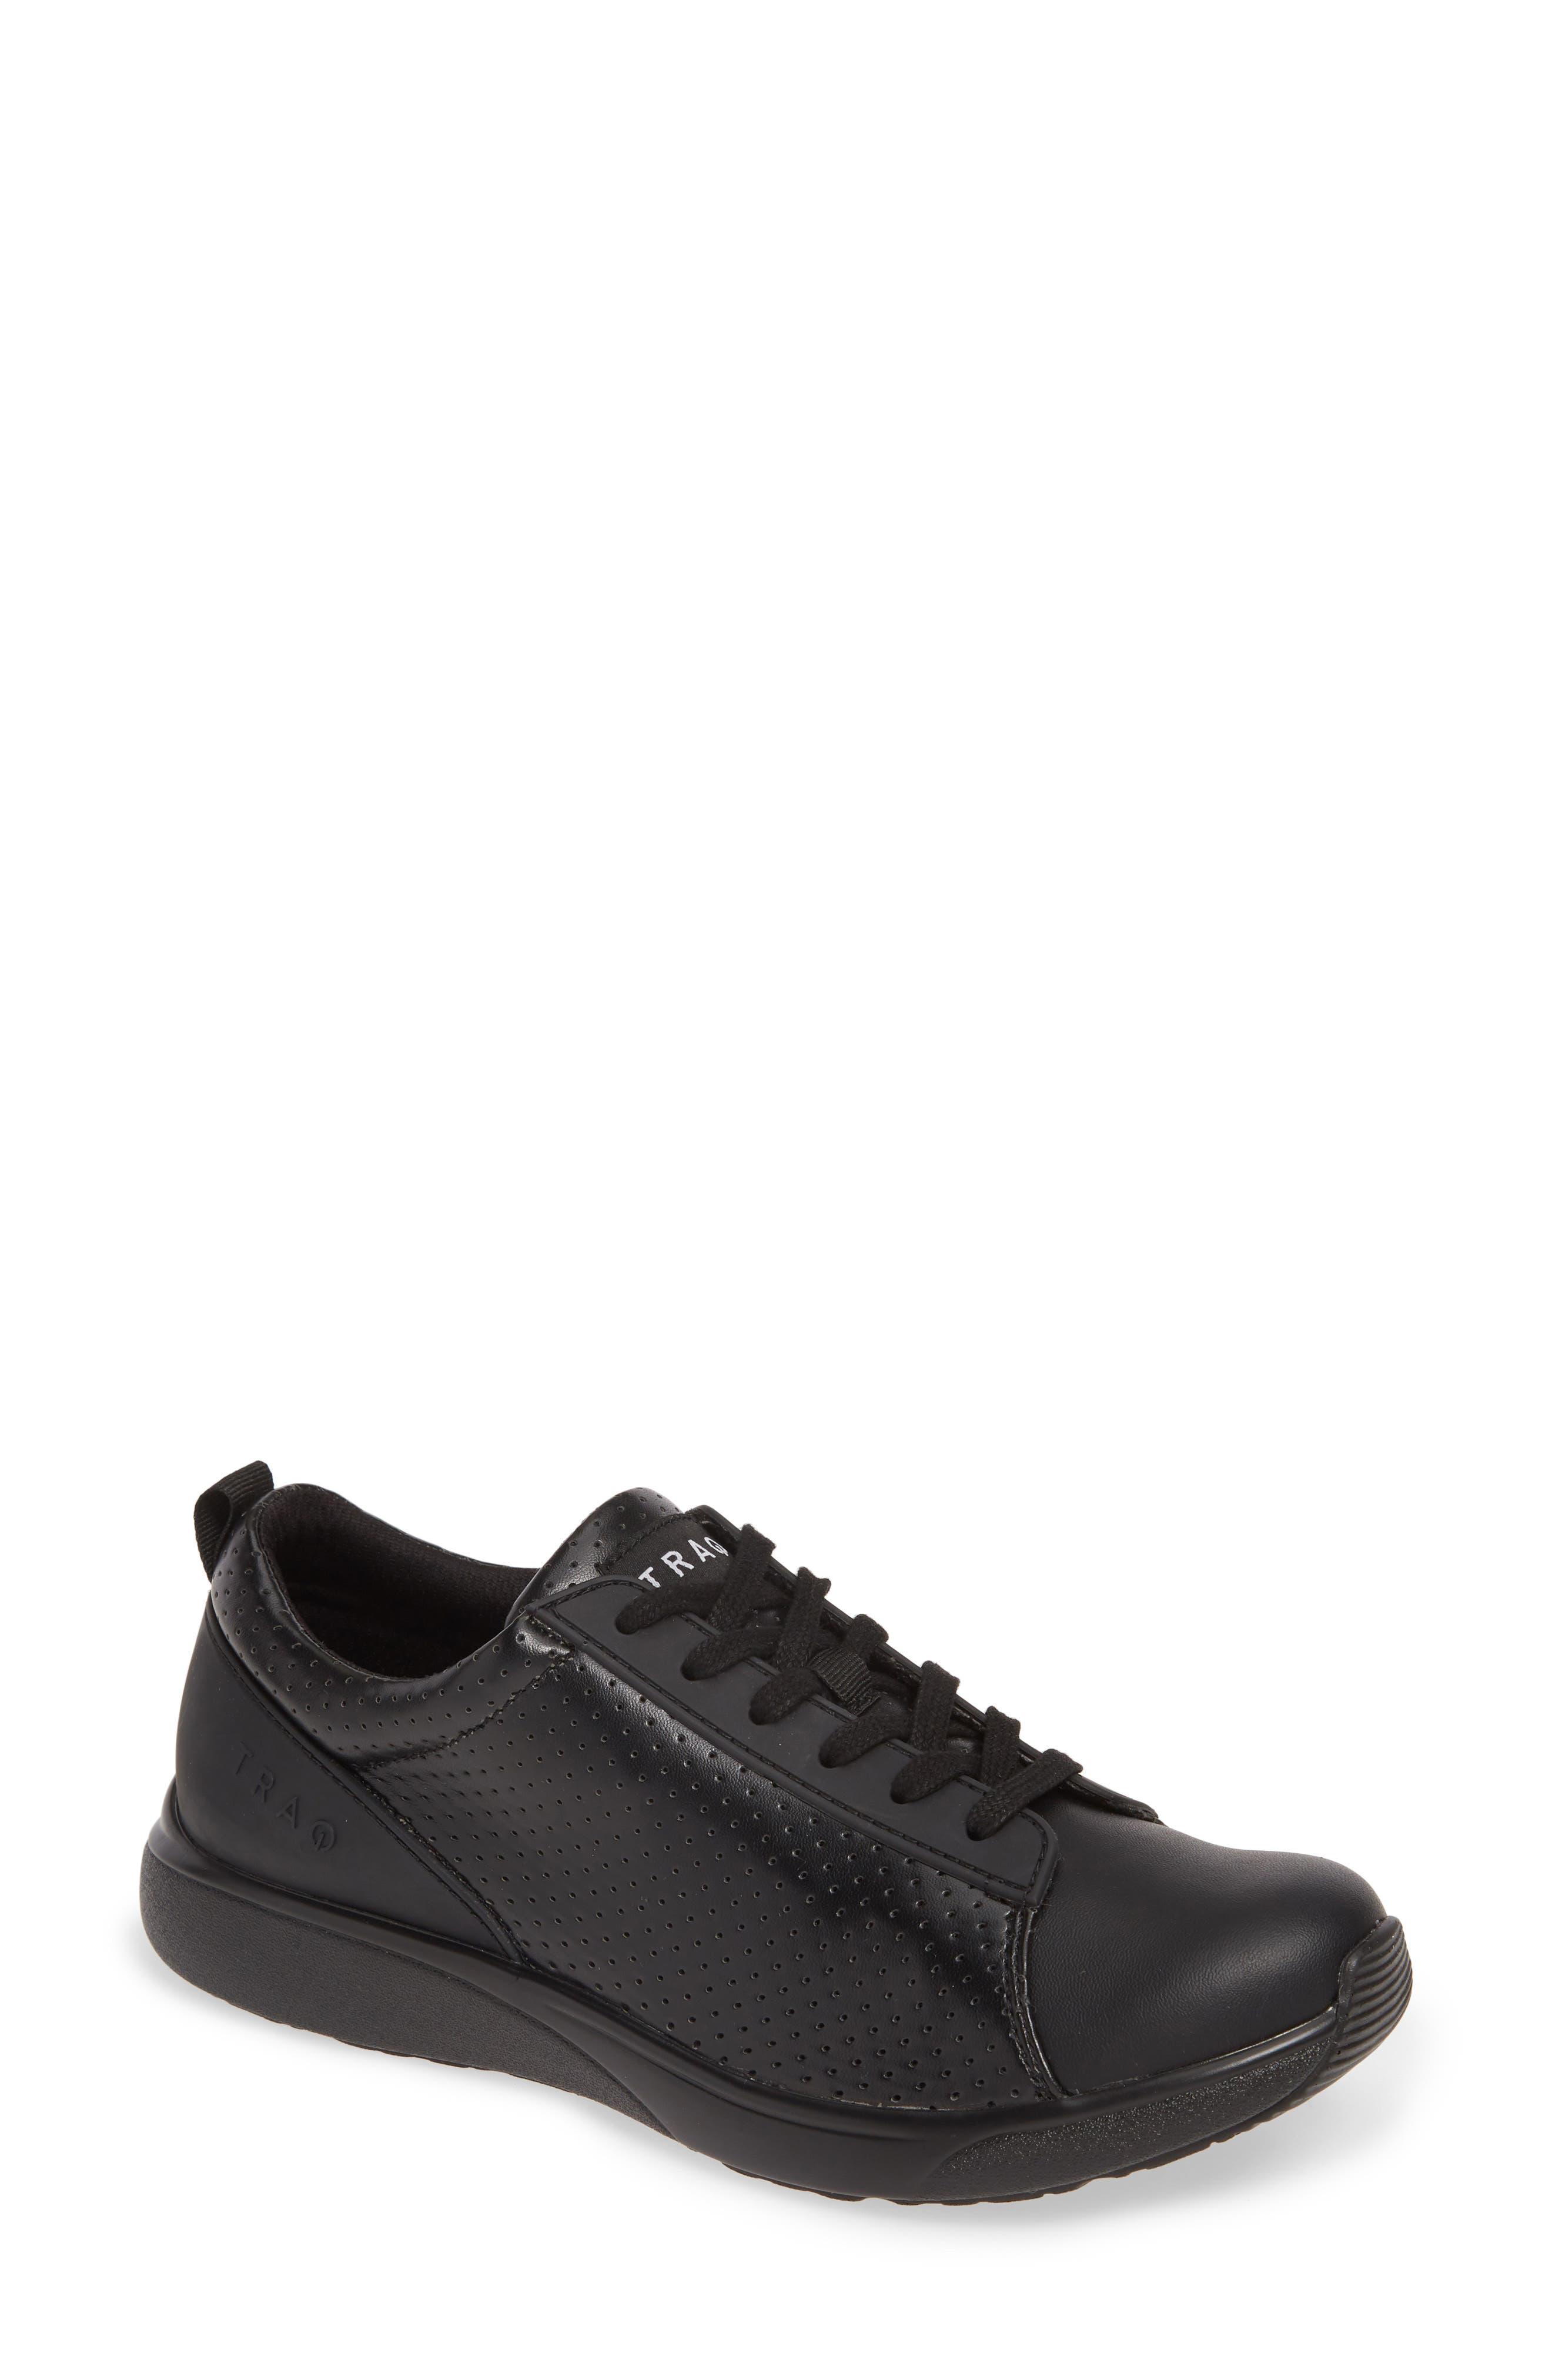 Alegria Qest Sneaker, Black